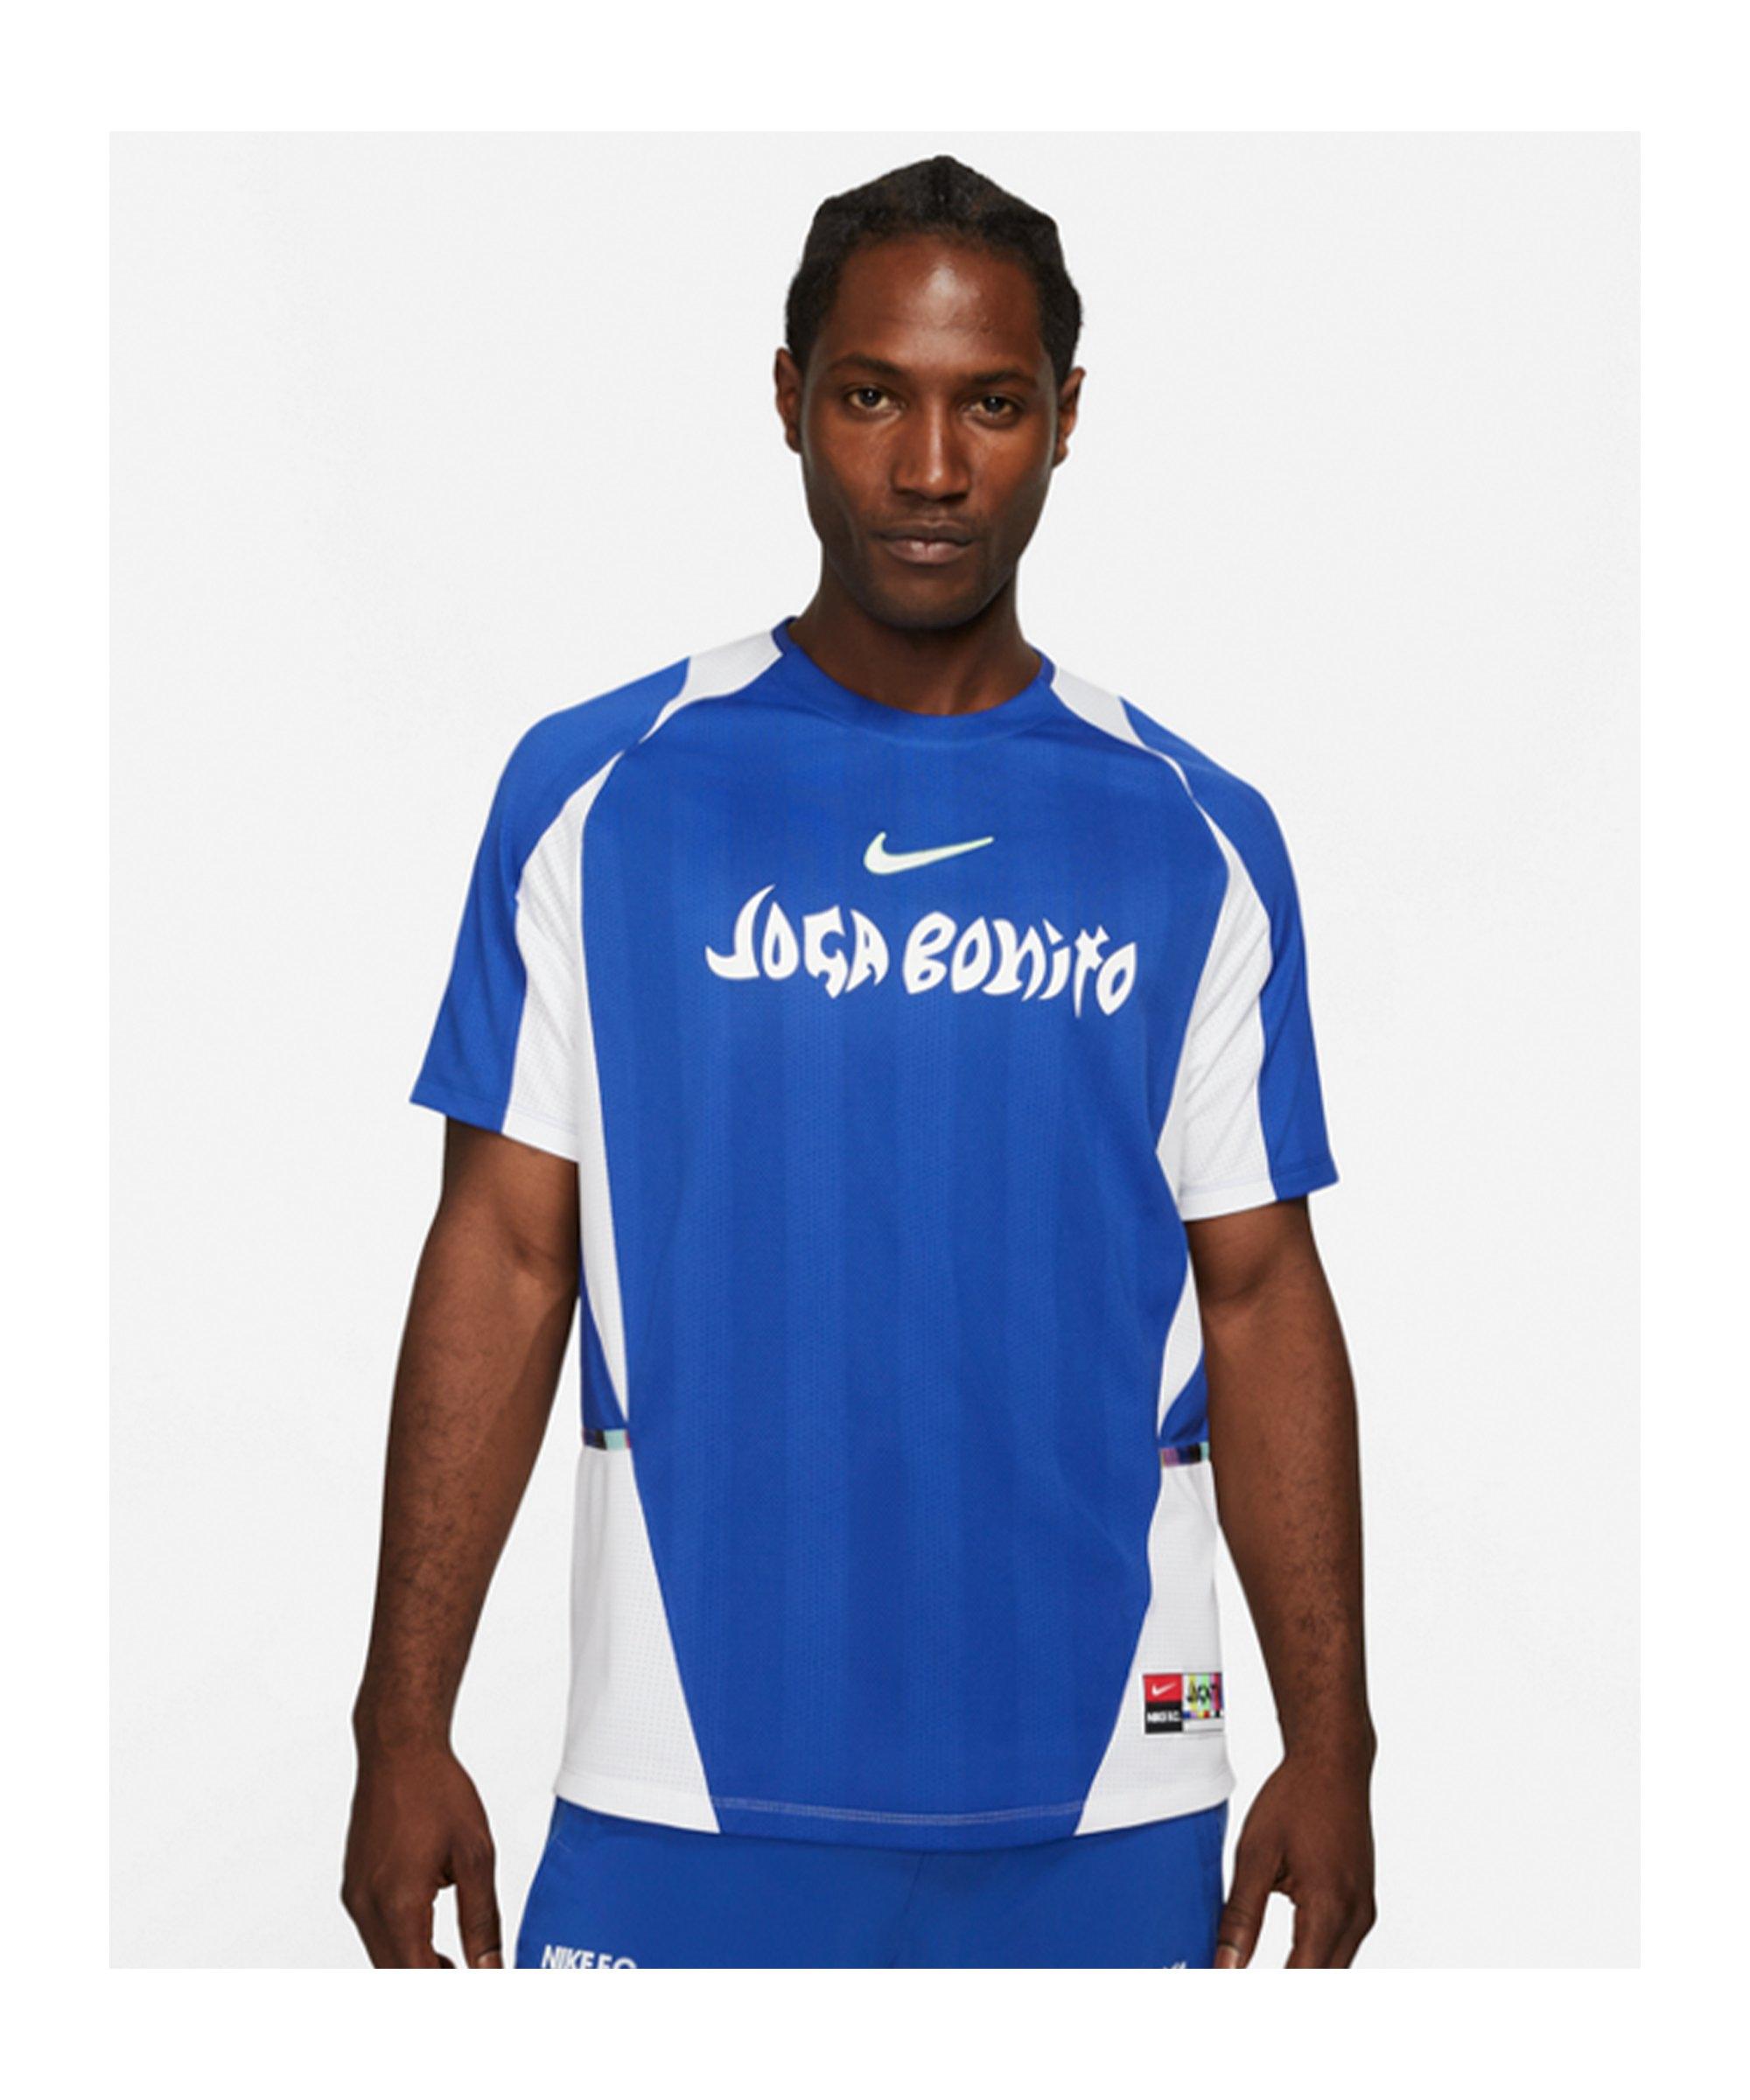 Nike F.C. Joga Bonito Home Jersey T-Shirt F480 - blau